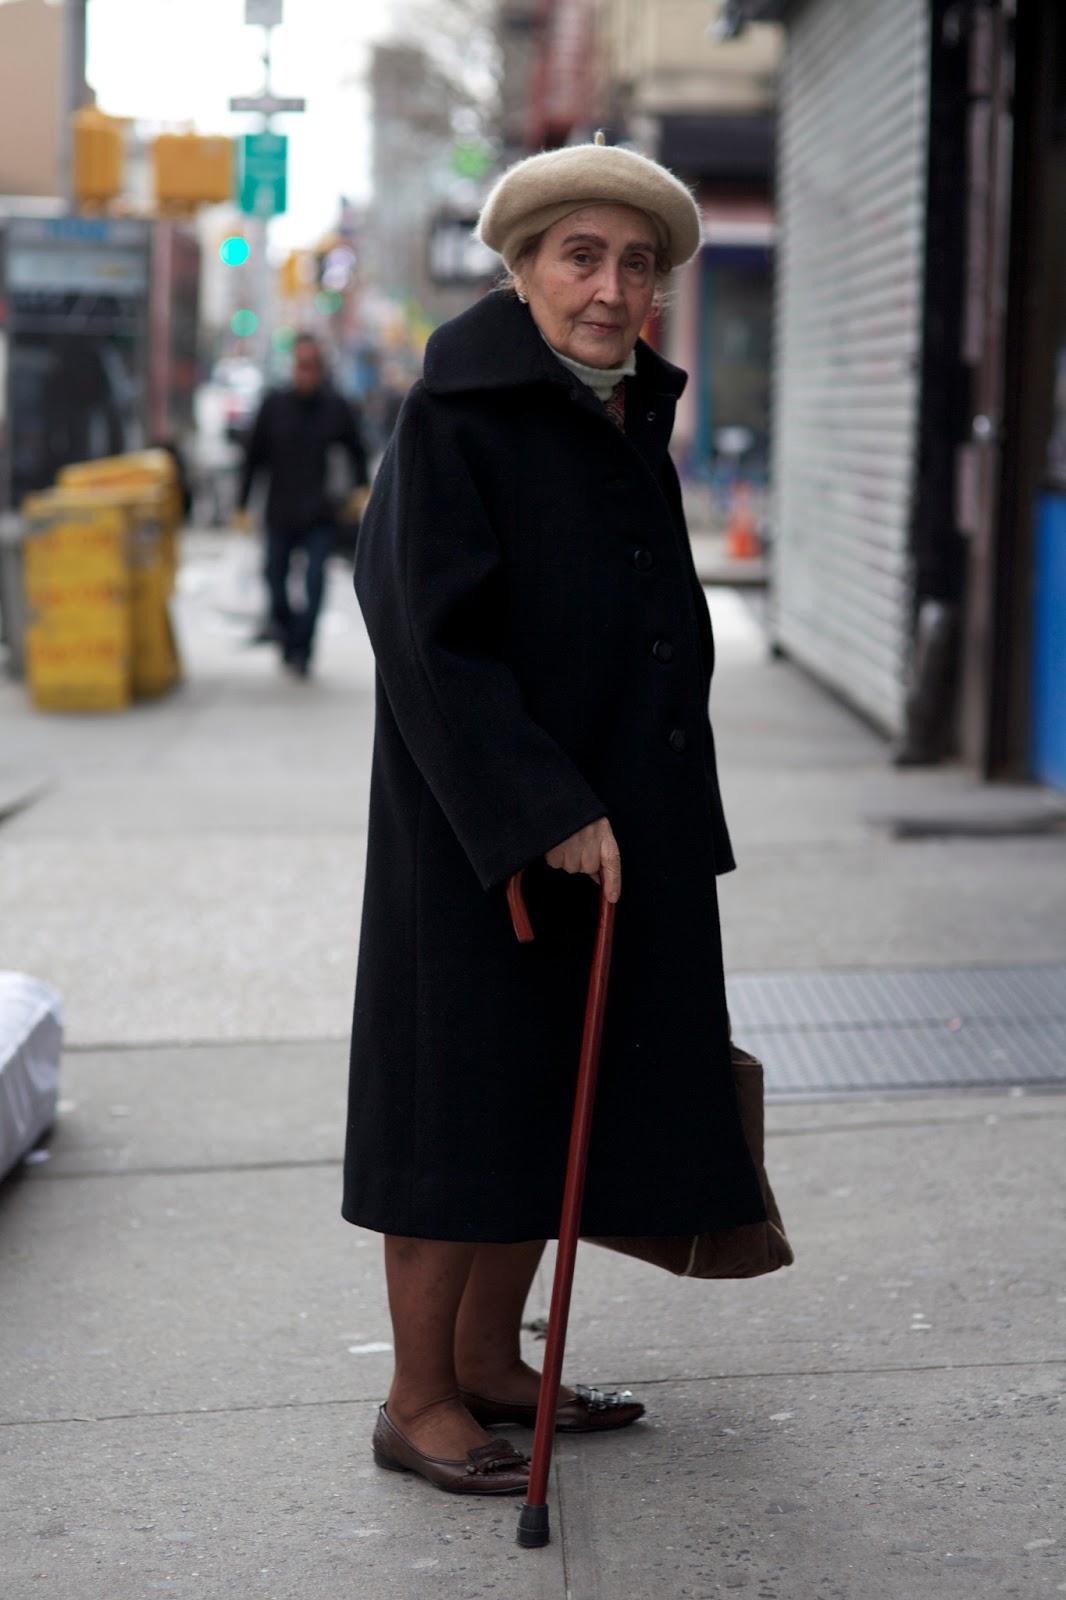 Old lady fashion show 45